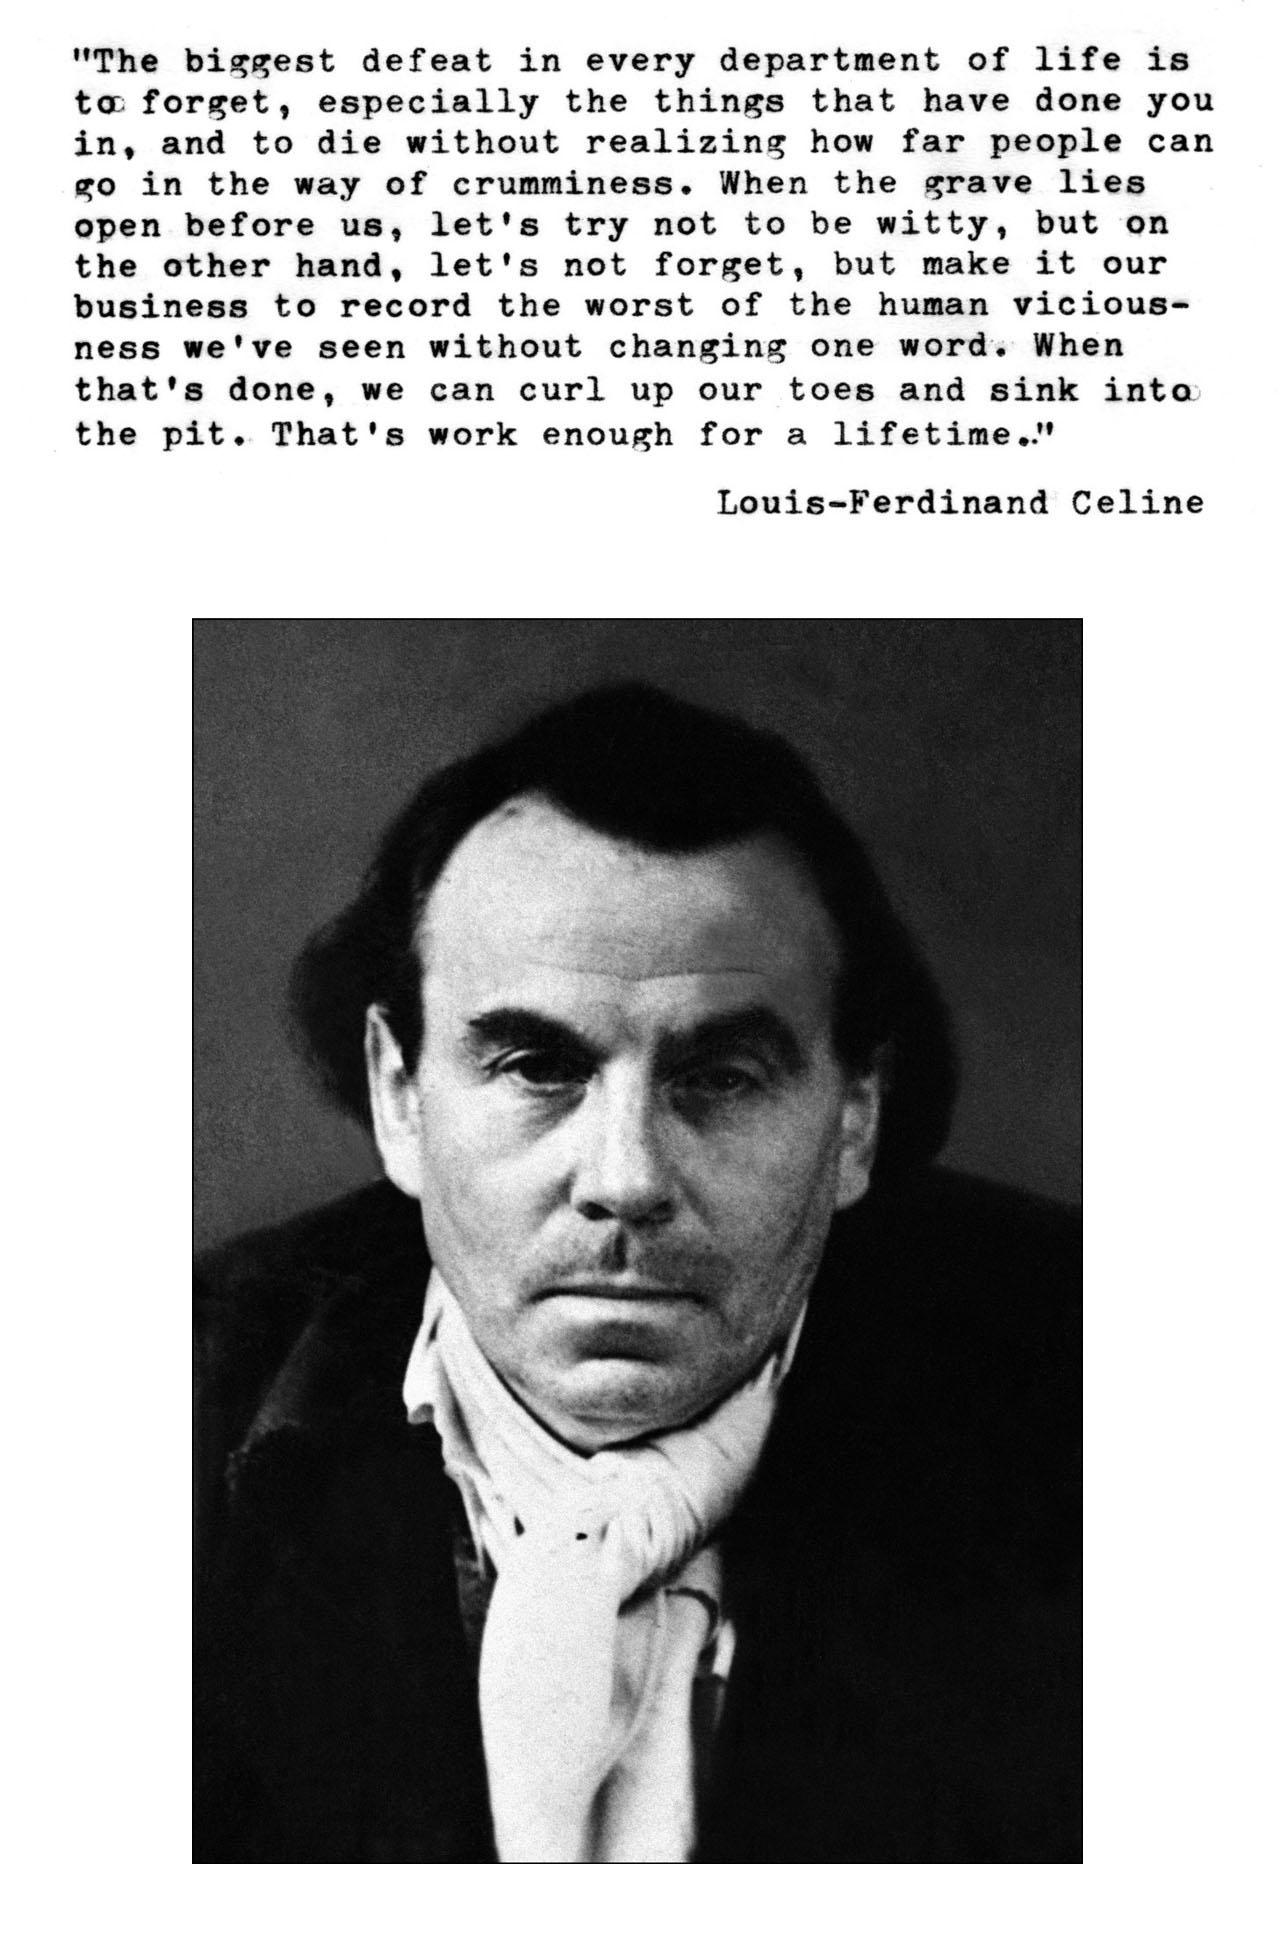 Louis-Ferdinand Celine's quote #1